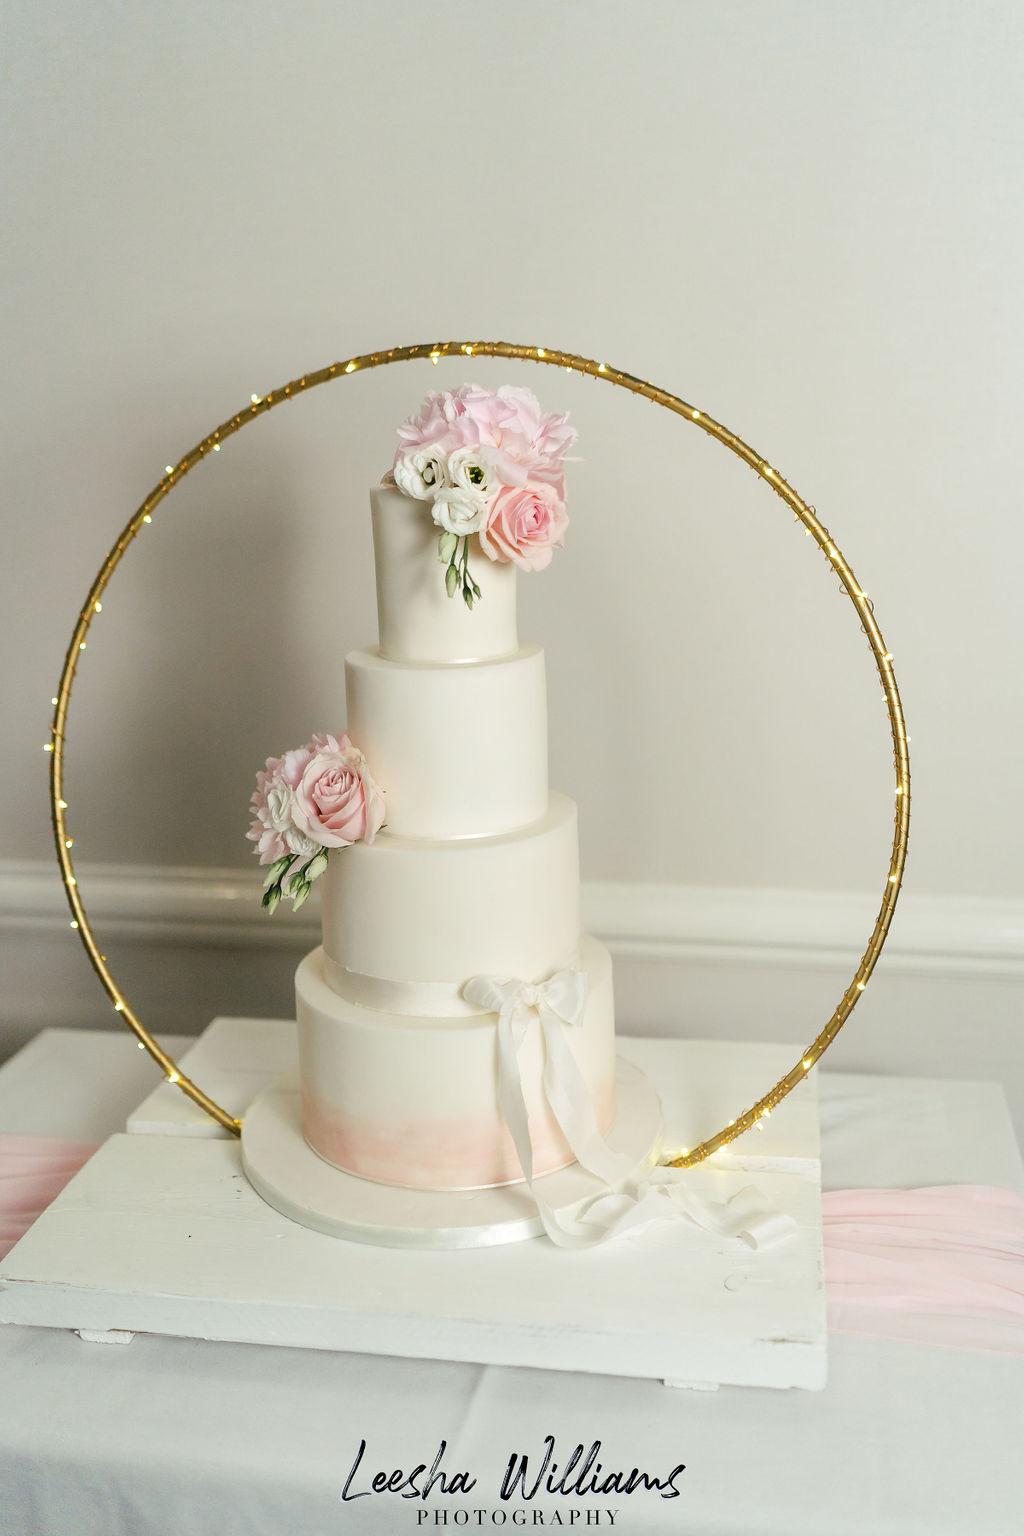 Pink Iced Wedding cake